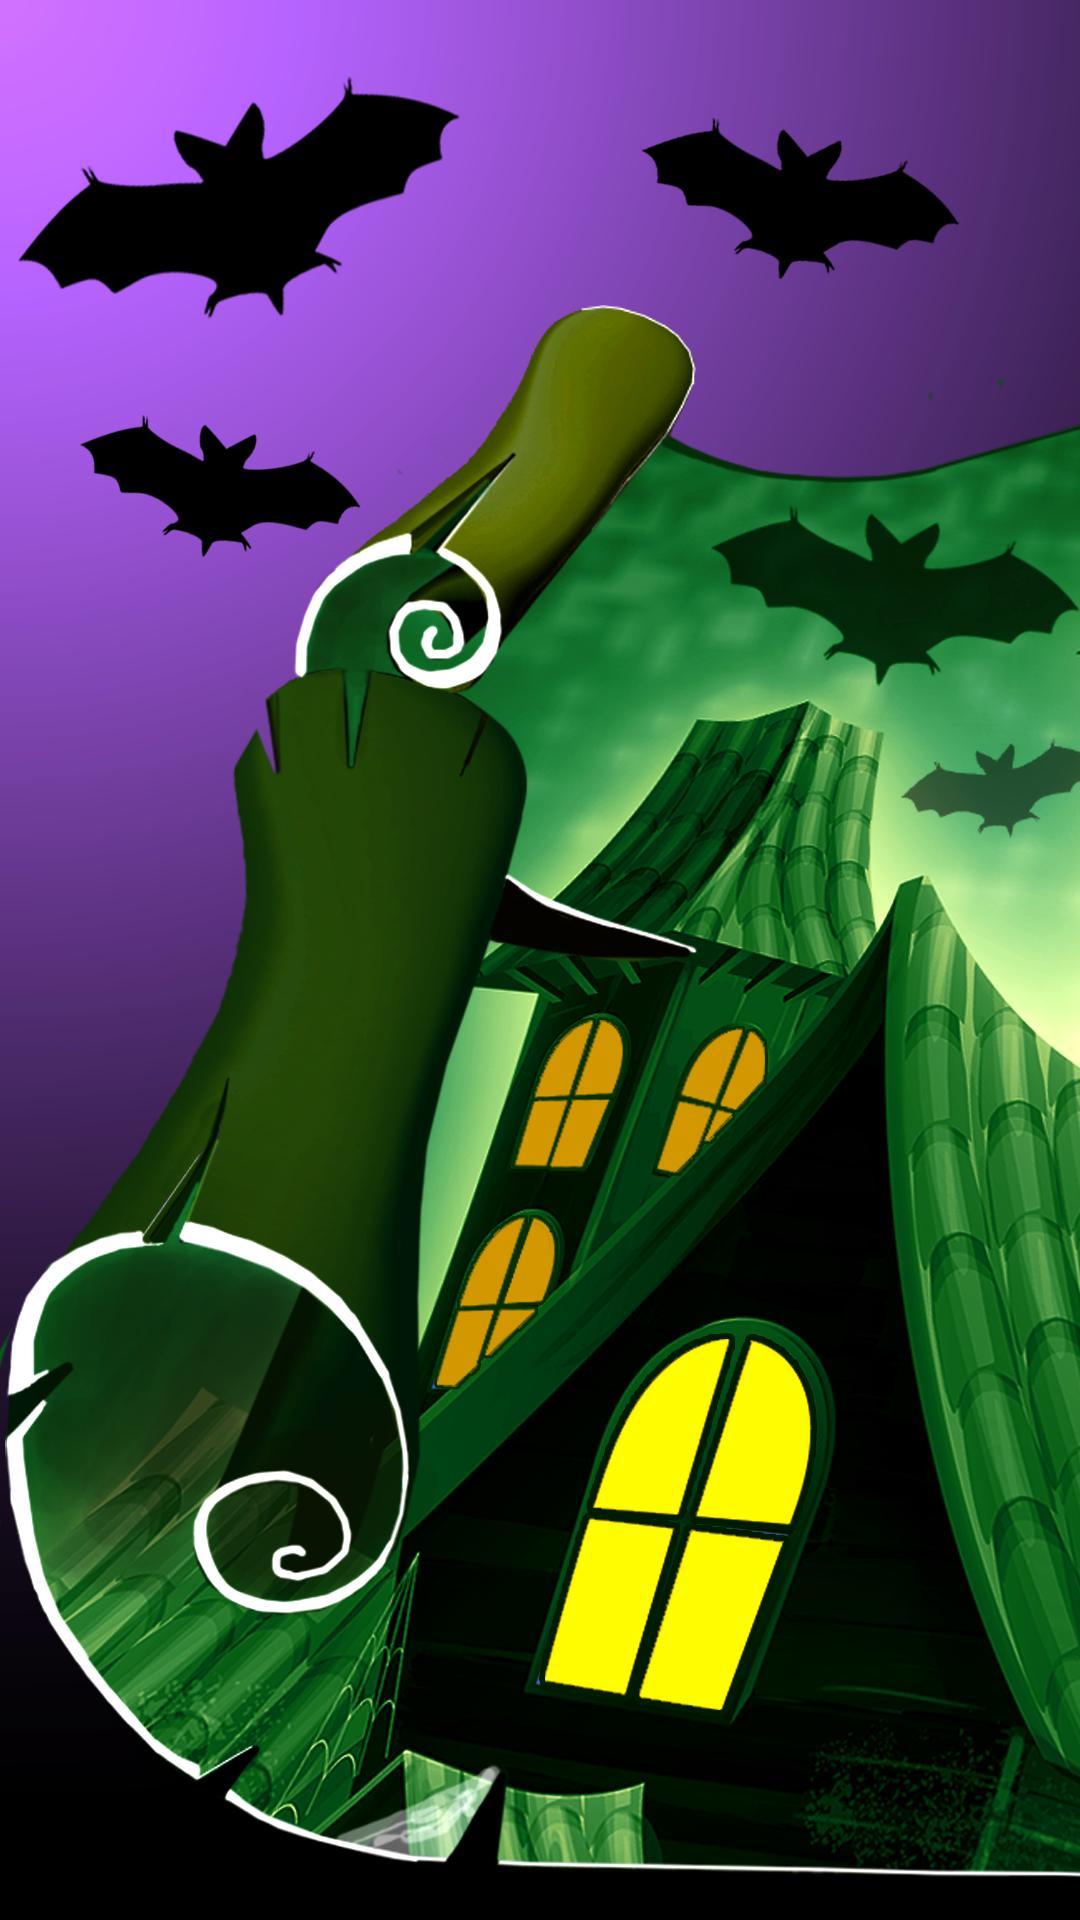 Android 用の 怖いハロウィーンの壁紙 ハロウィンの背景ハロウィンの絵